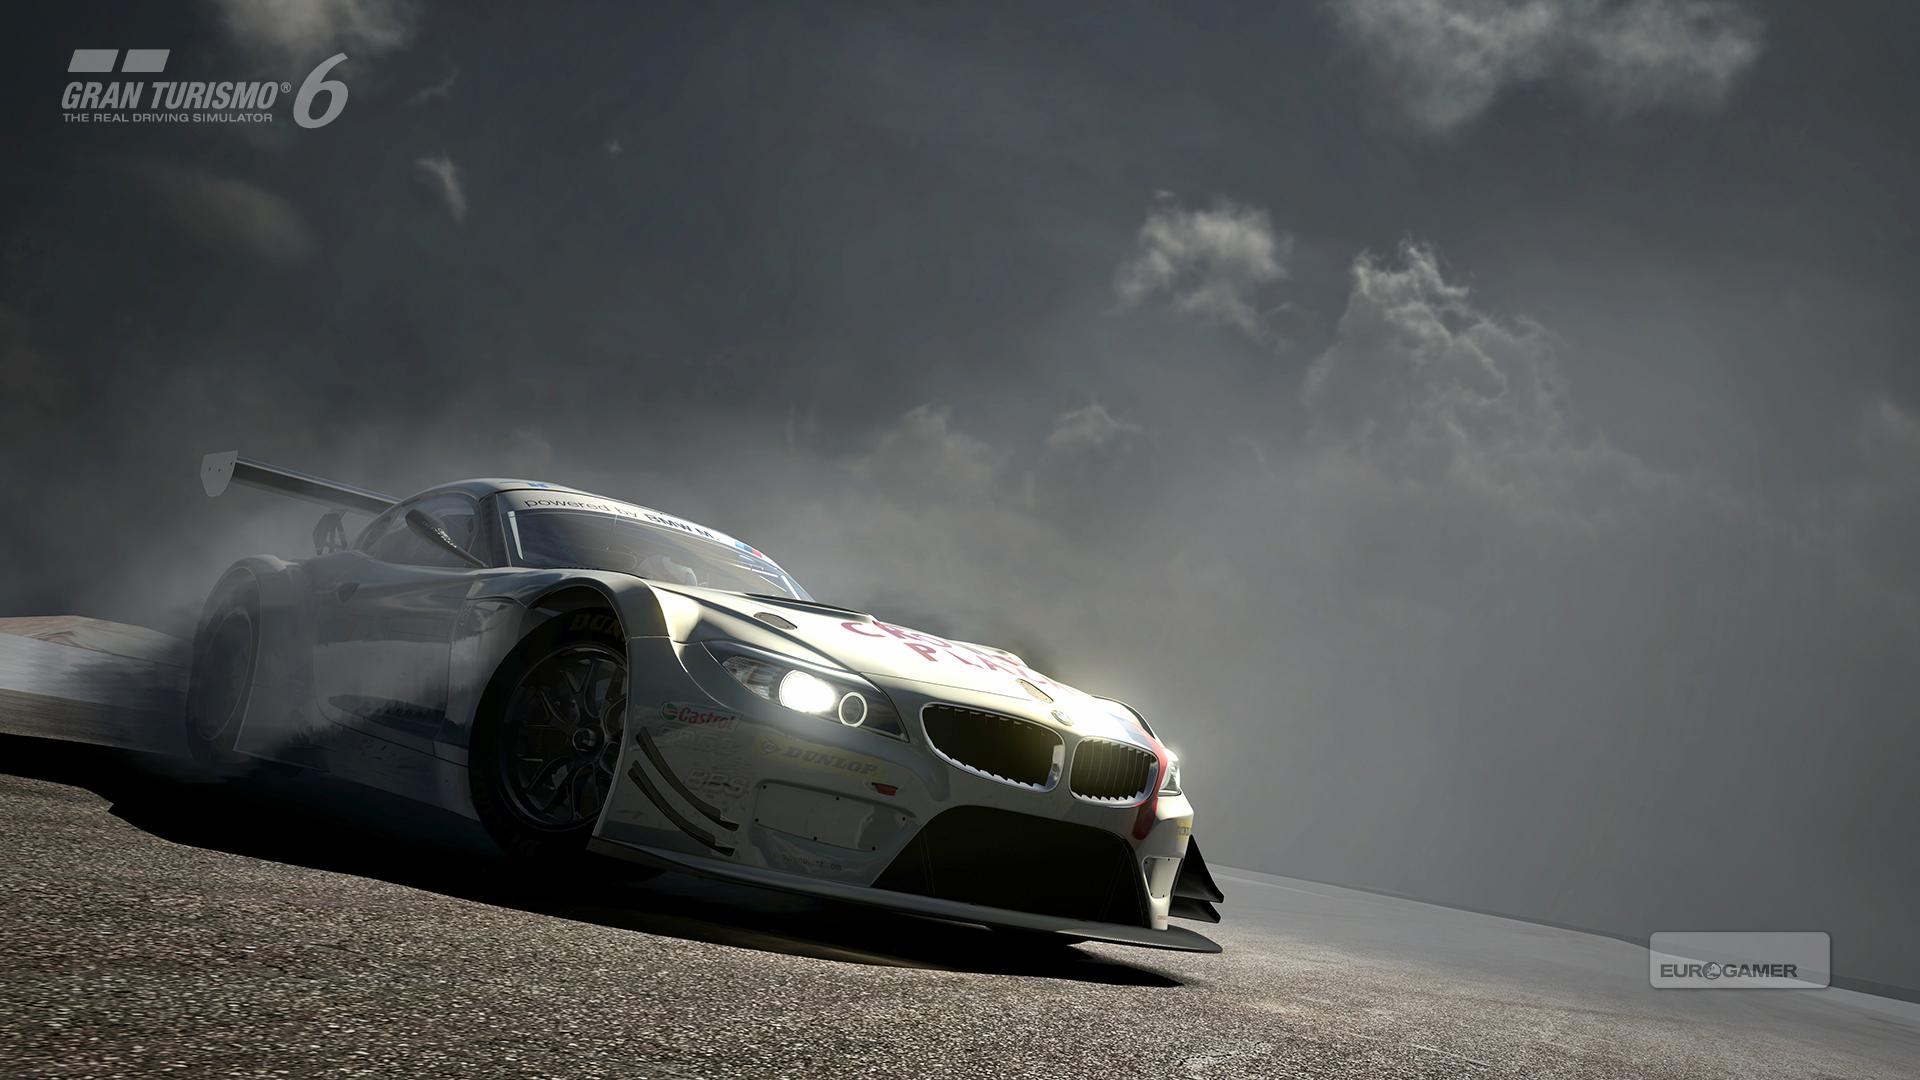 Gran Turismo Background 34883 1920x1080 px